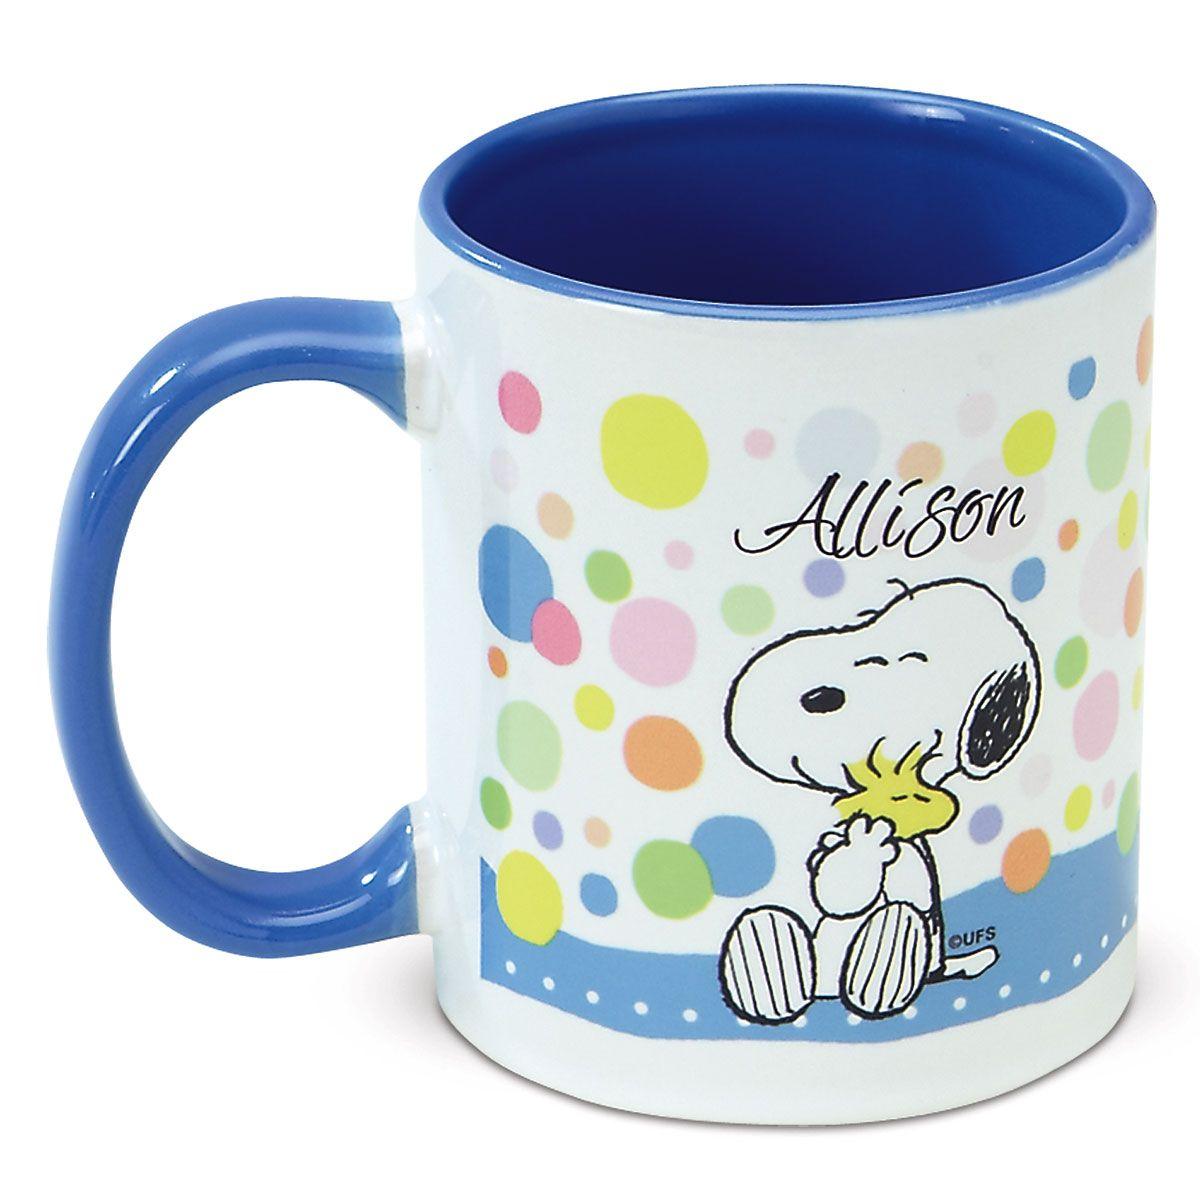 PEANUTS® Personalized Mug